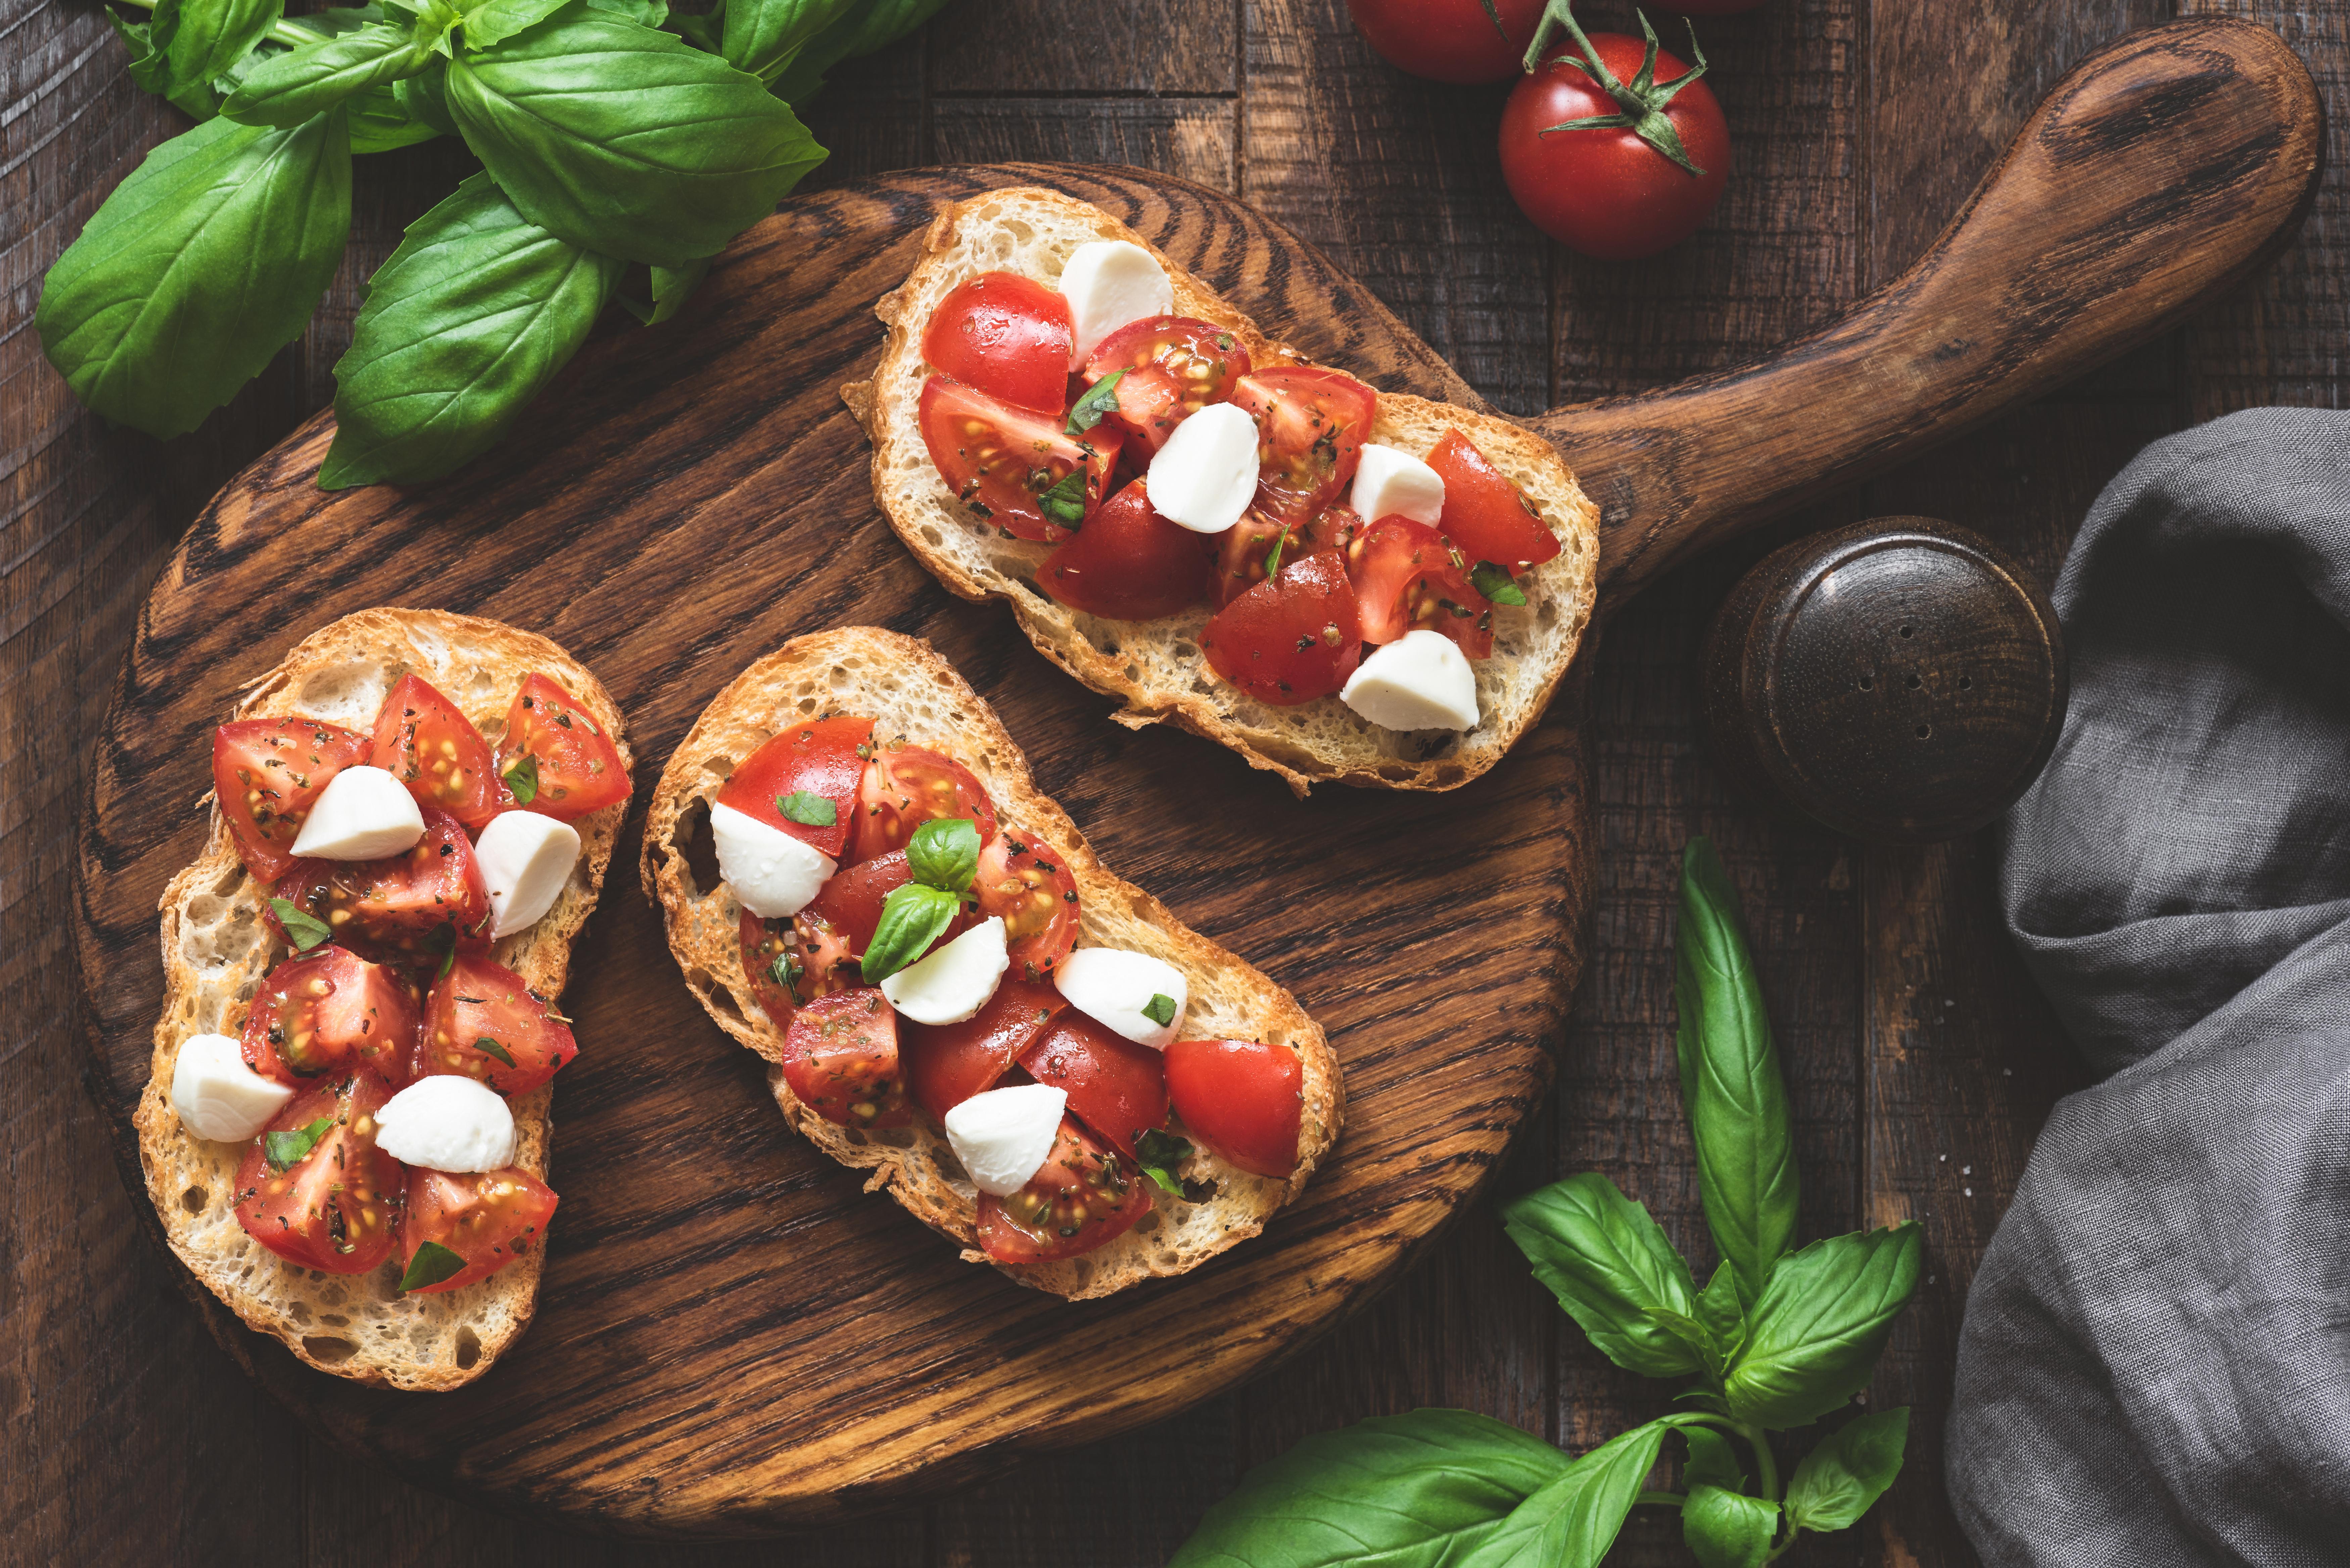 Italian bruschetta antipasti with tomatoes, mozzarella cheese and basil on wood board